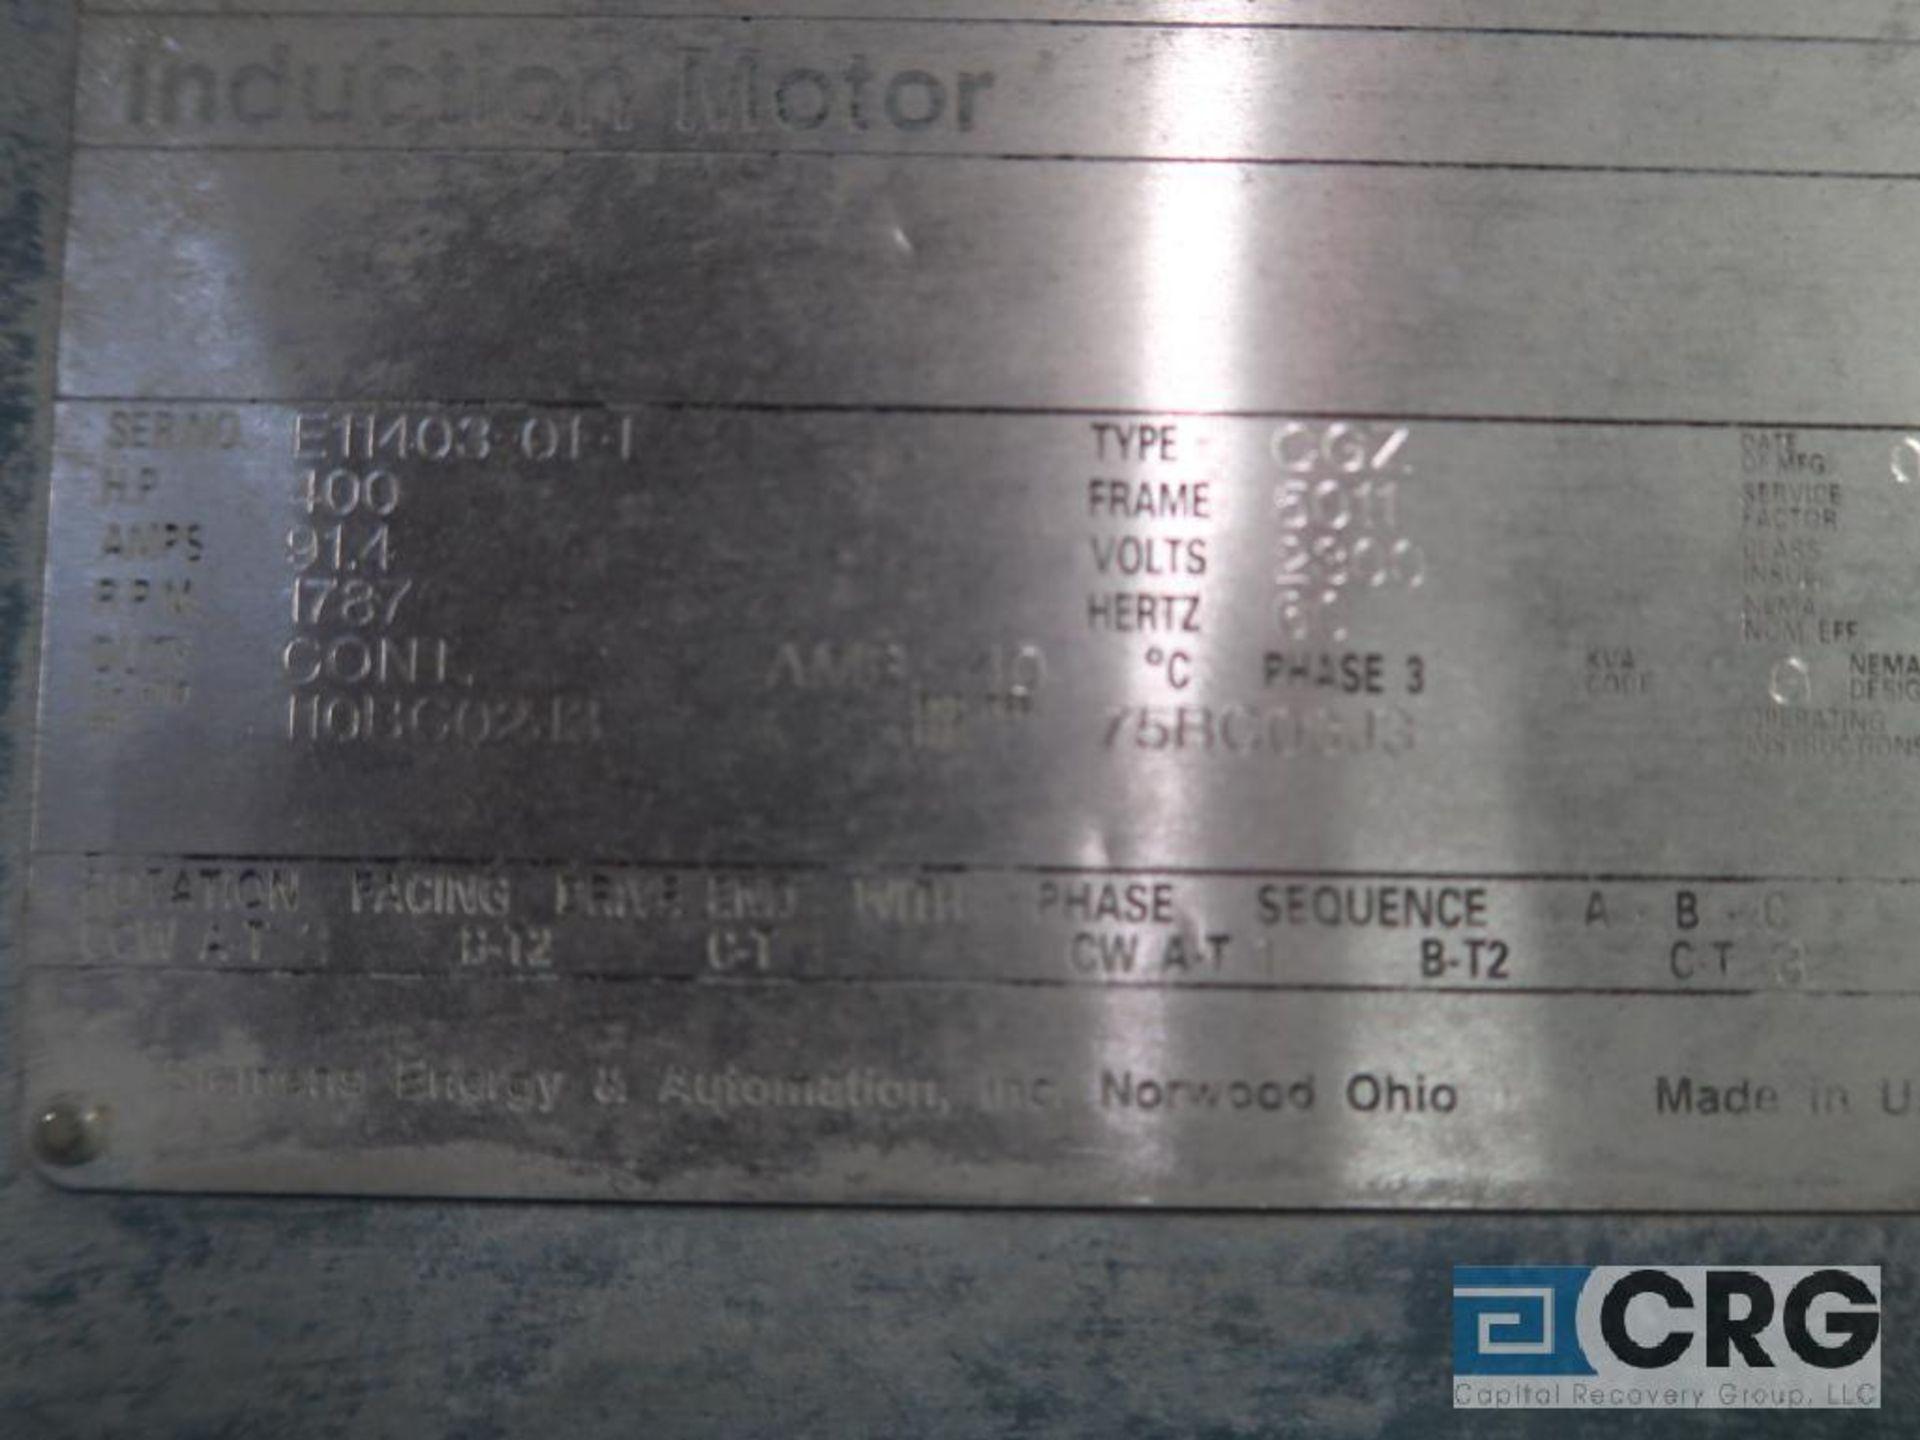 Siemens motor, 400 HP, 1,787 RPM, 2,300 volt, frame 5011, year 1992, s/n E11403-01-1, equipment # - Image 2 of 2